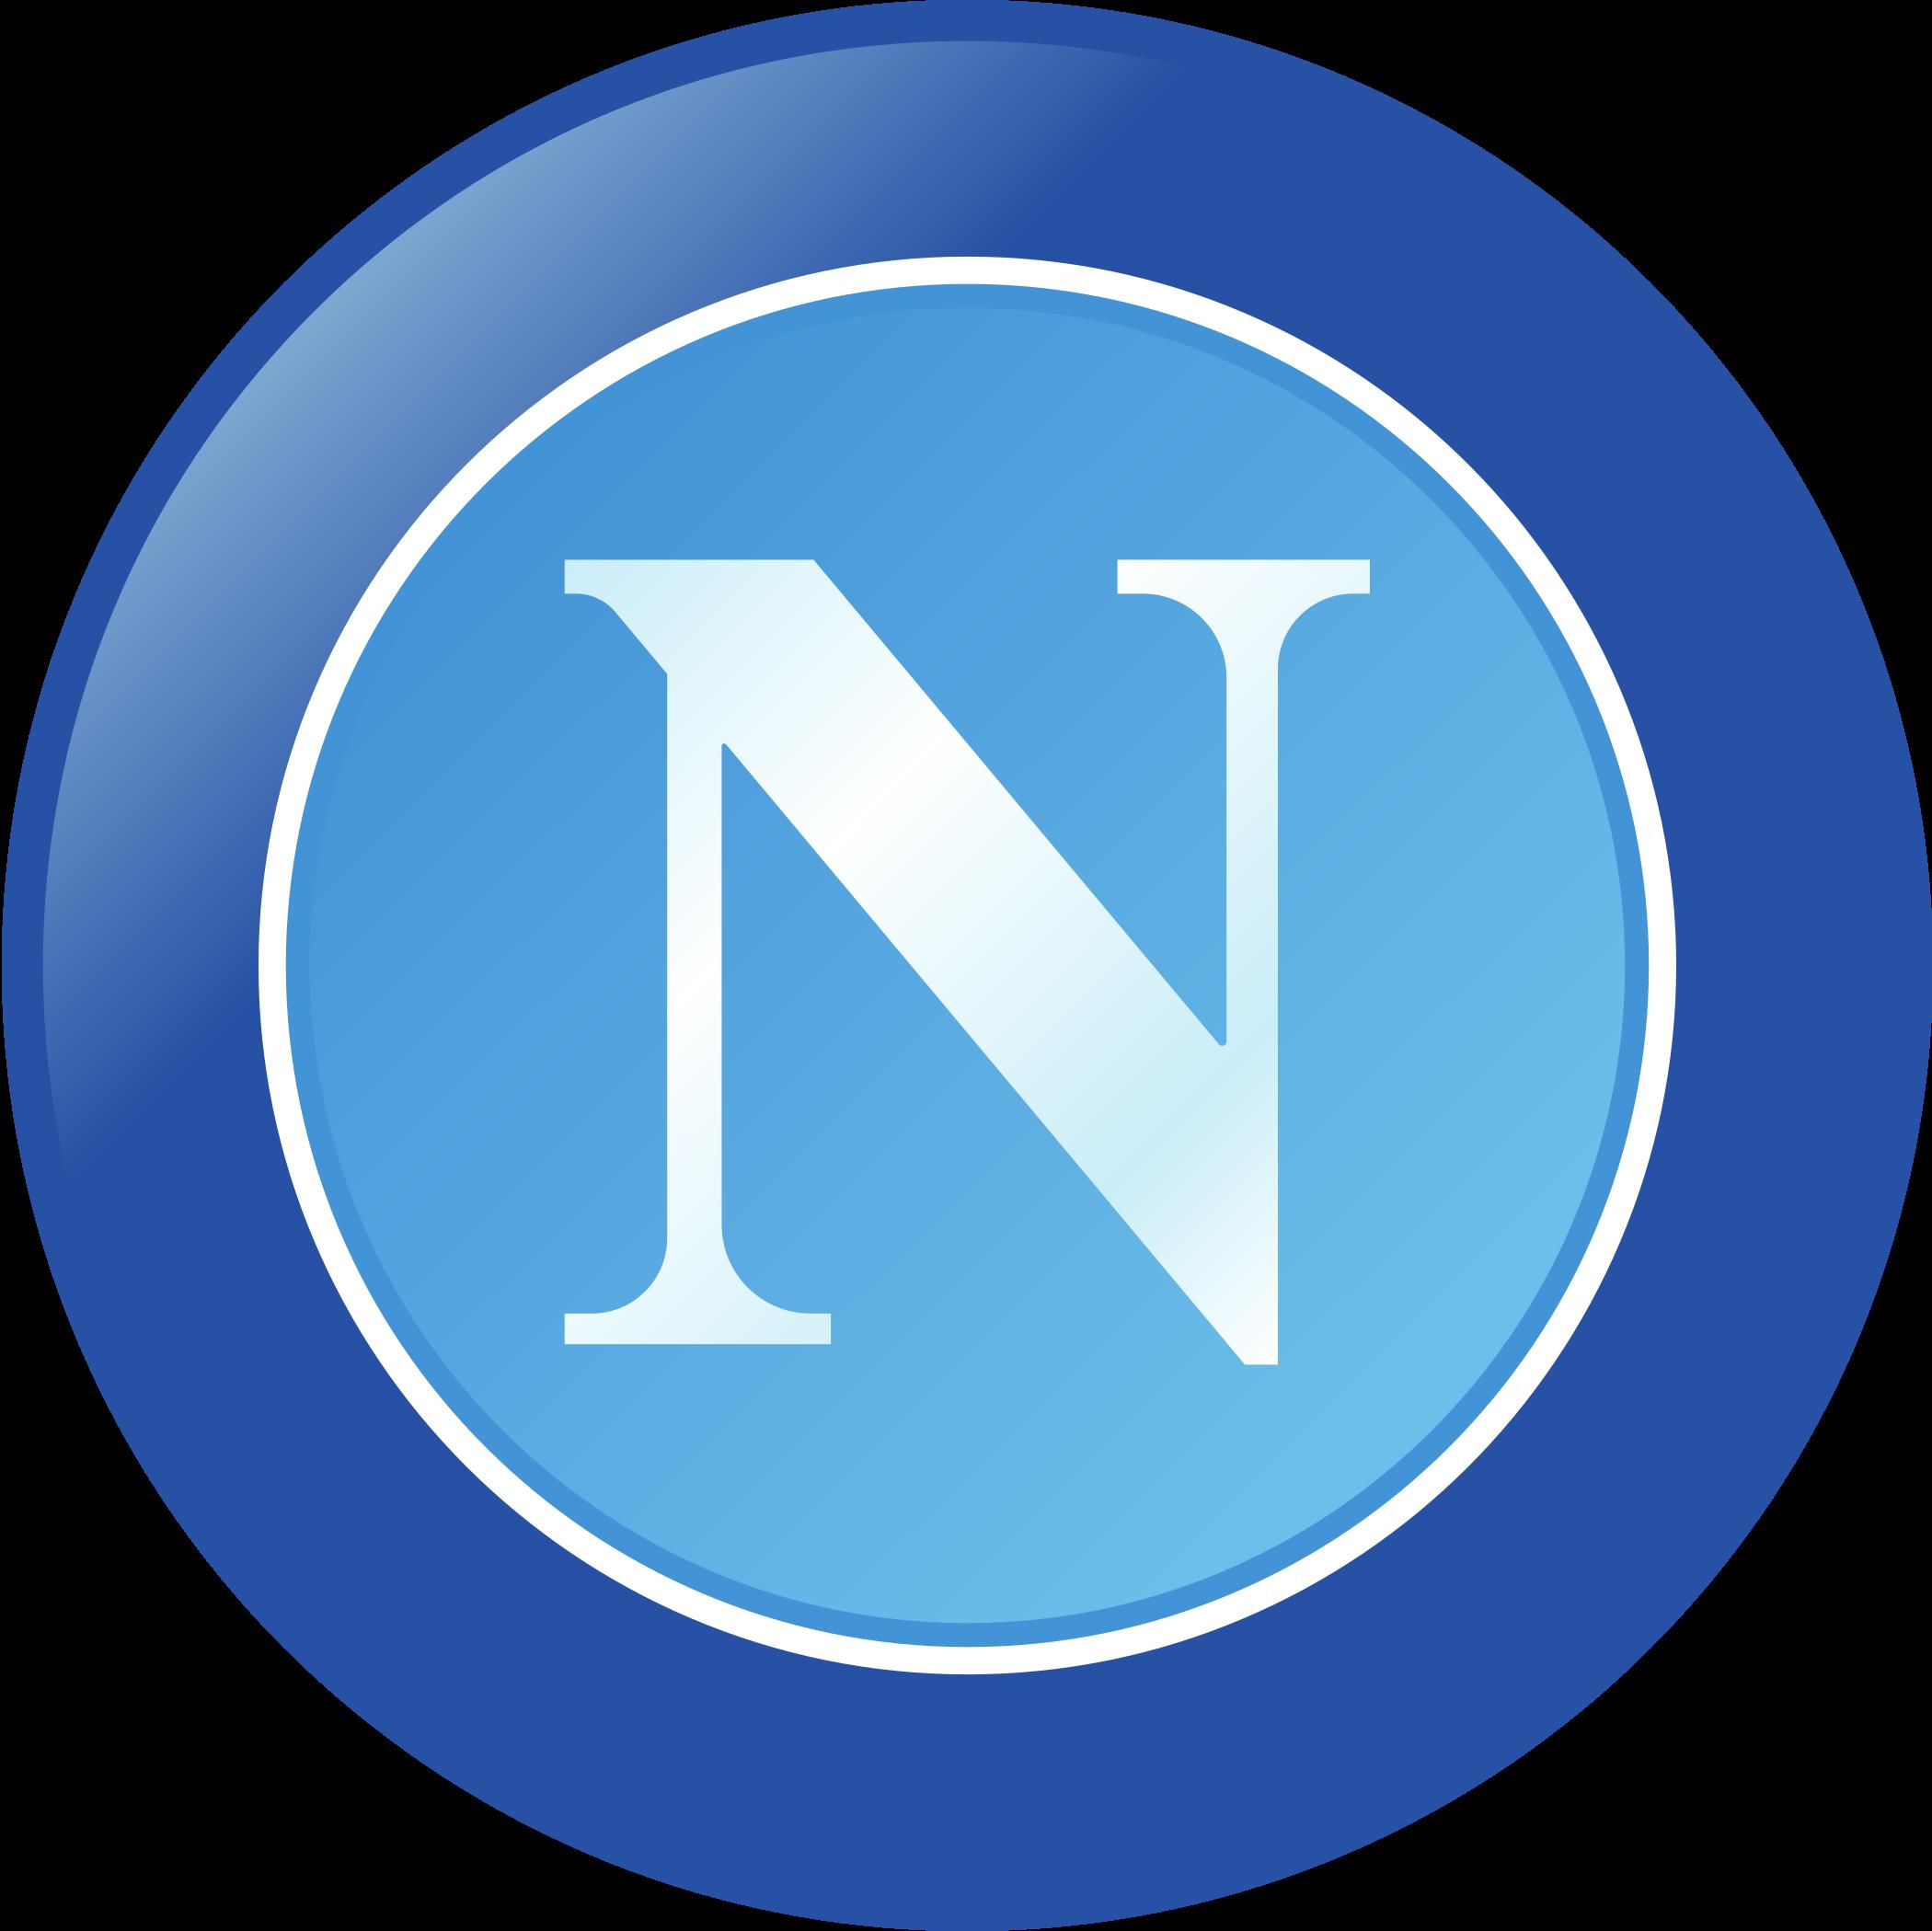 napoli-logo-escudo-1